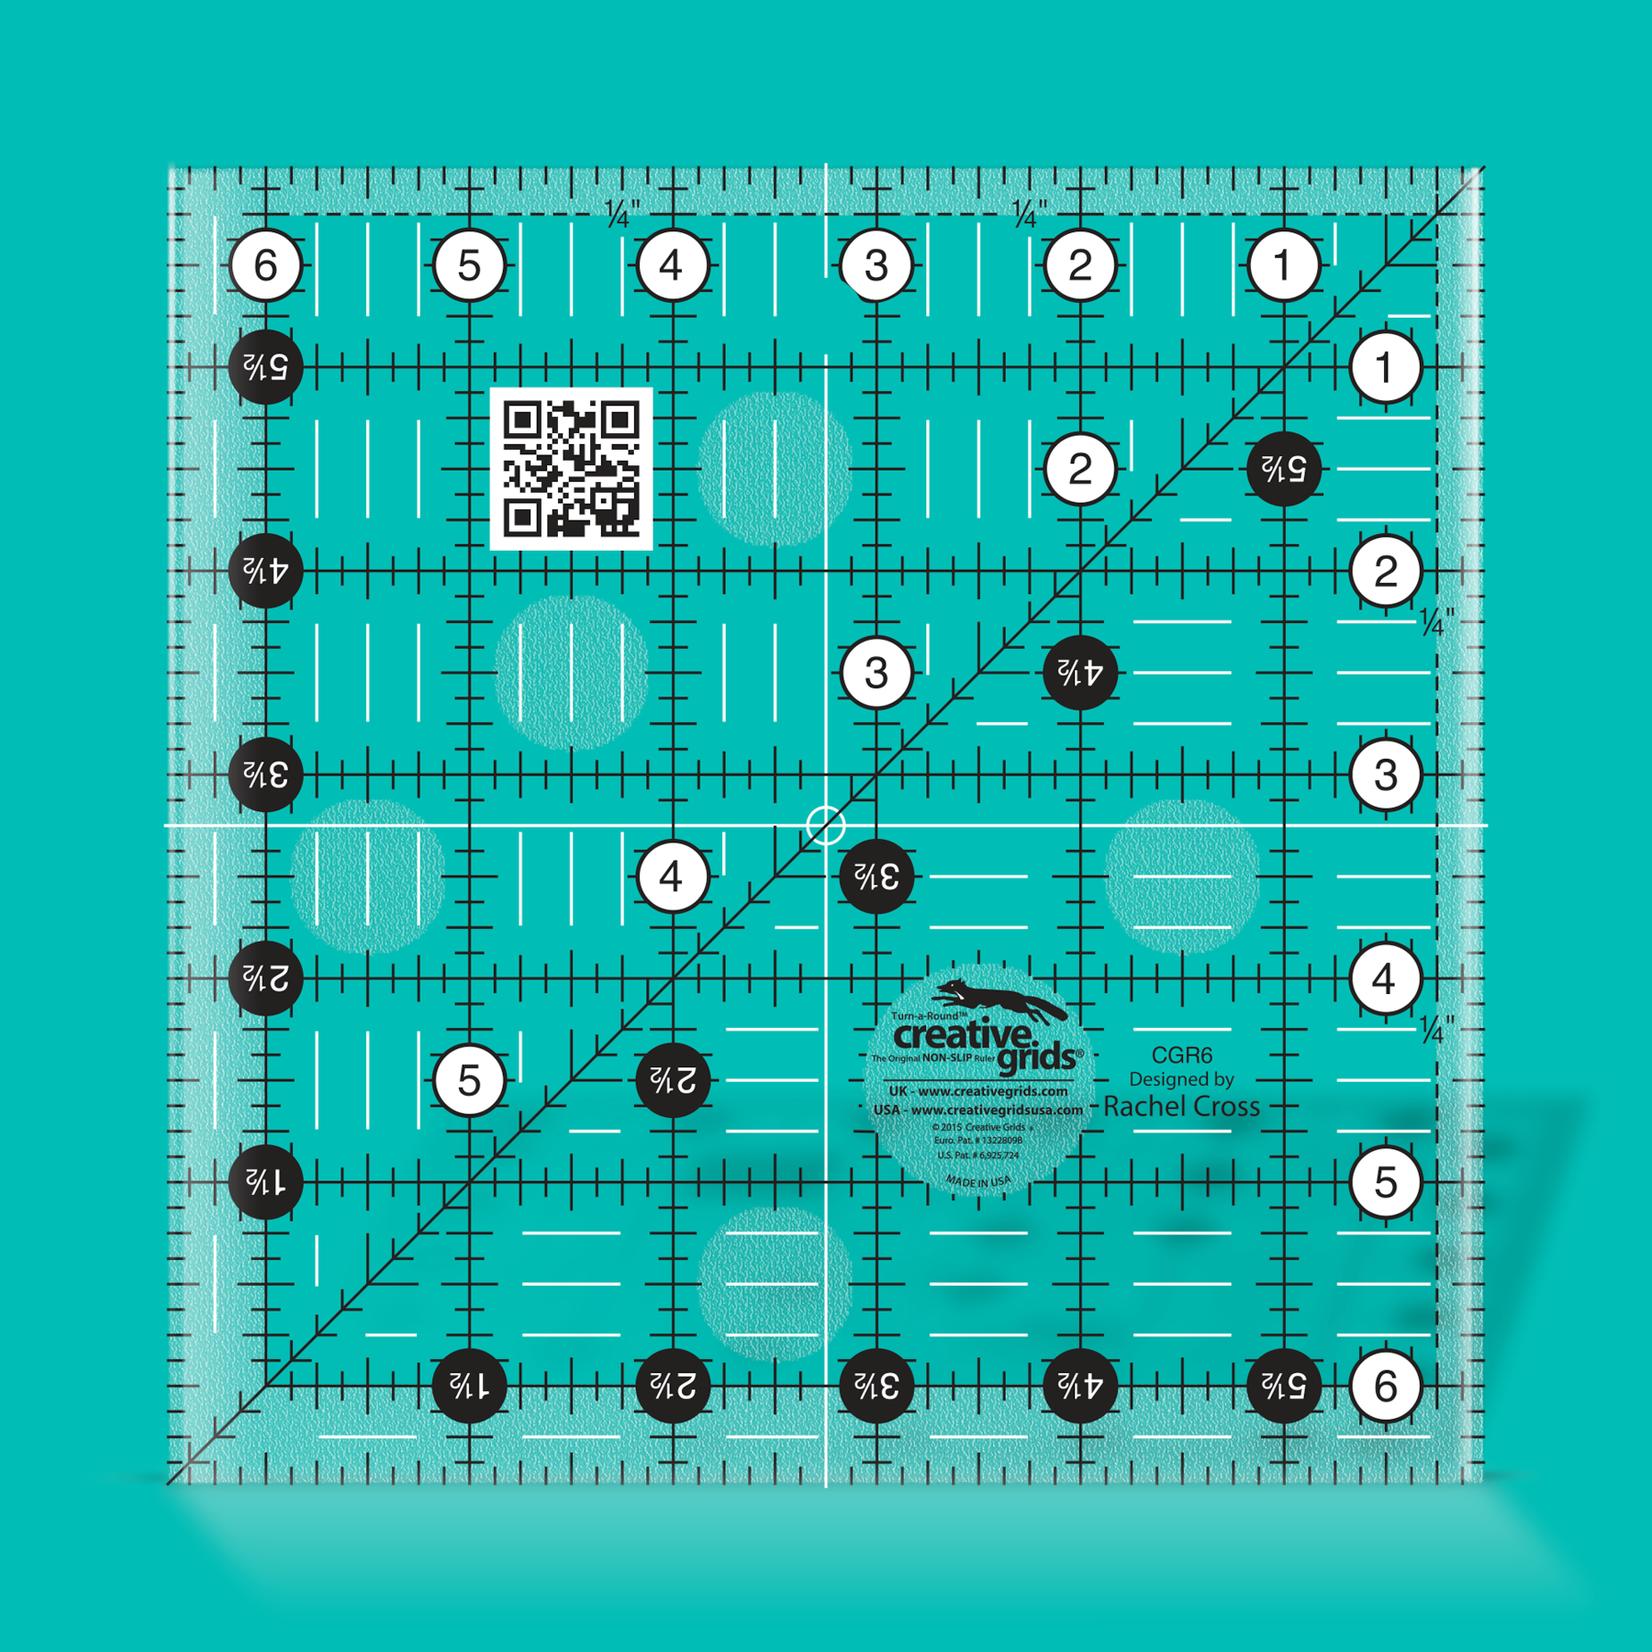 Creative Grids Creative Grids 6 1/2X6 1/2 Ruler CGR6